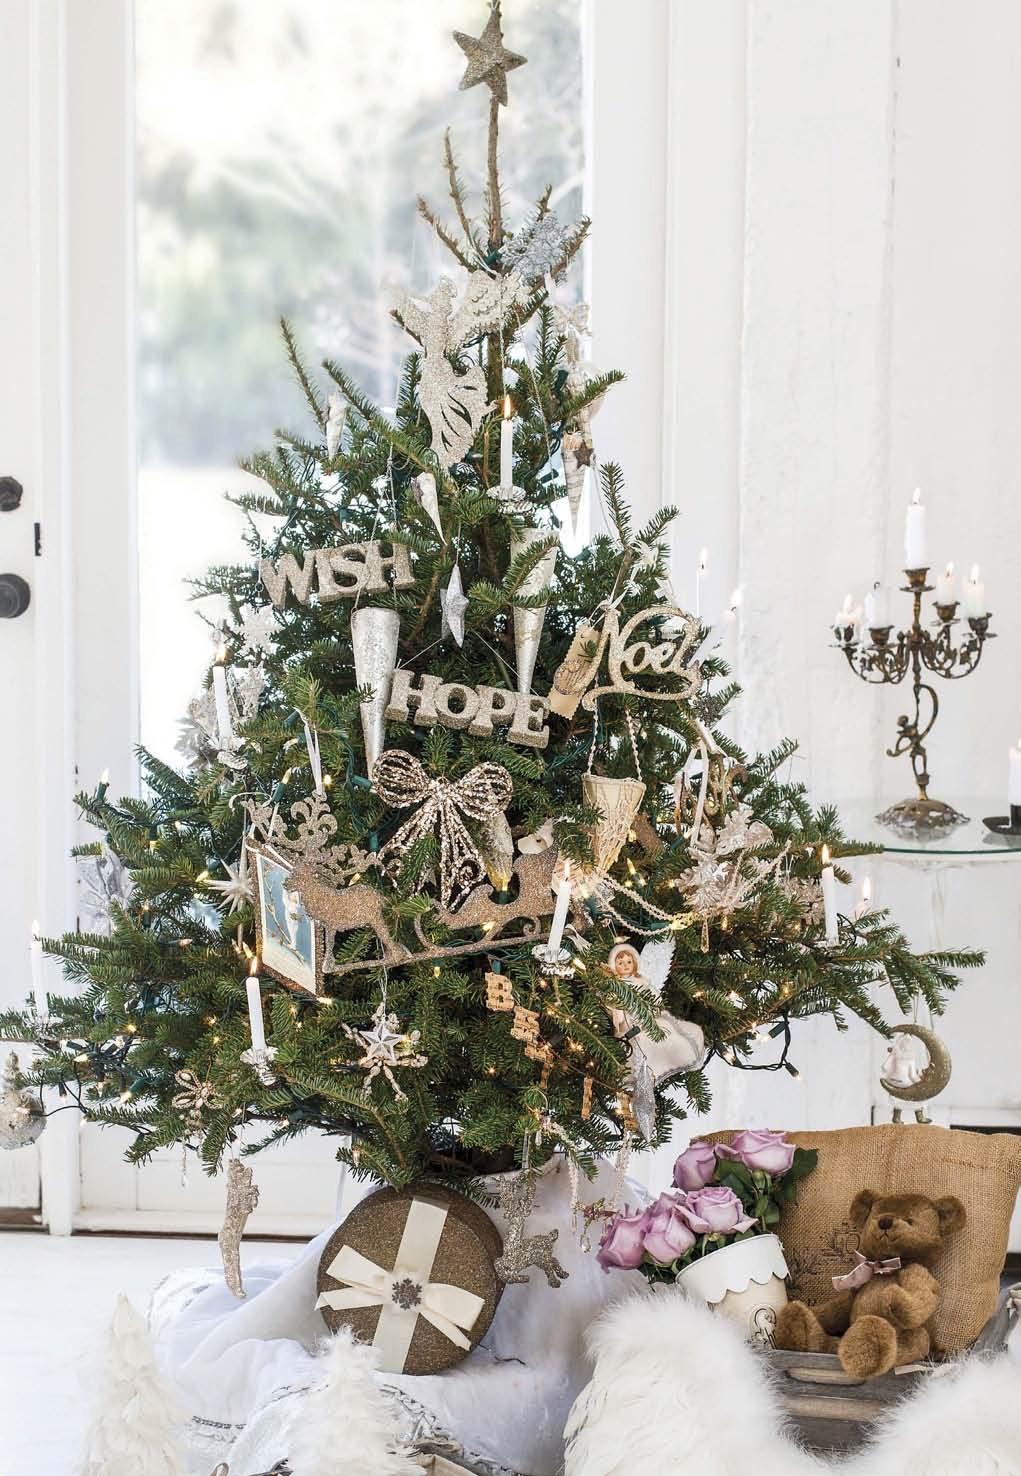 Christmas In Evergreen Tidings Of Joy.Tidings Of Joy Pocketmags Com